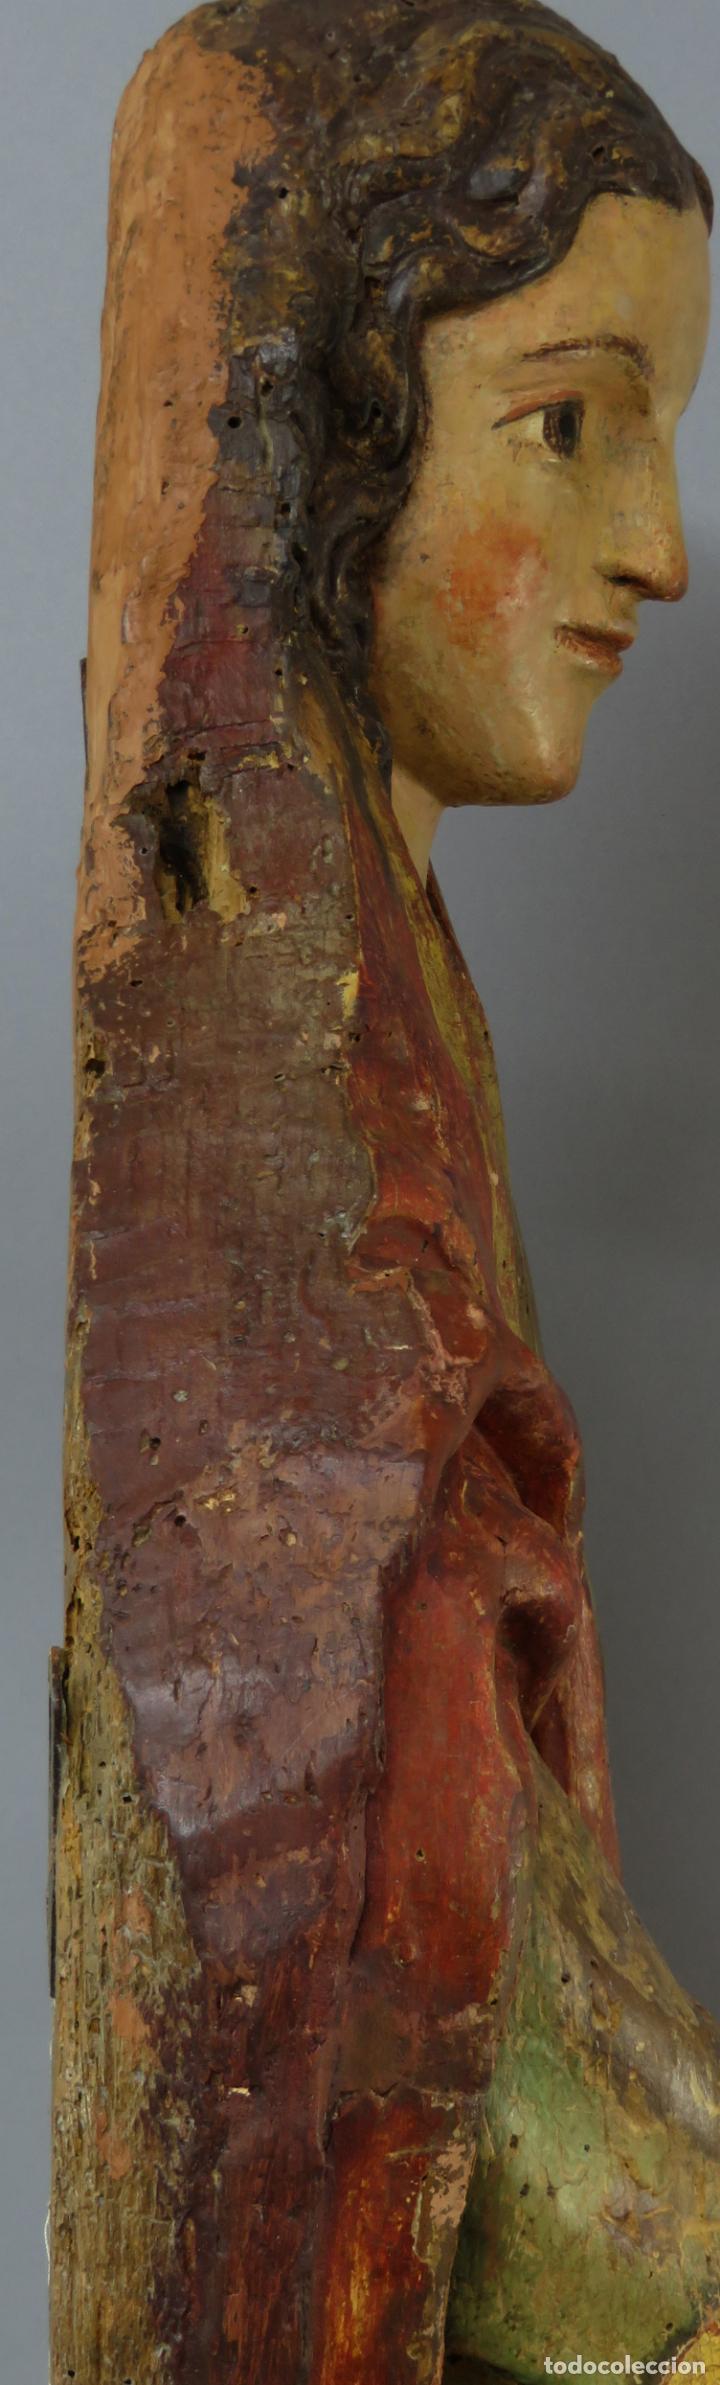 Arte: Talla de medio bulto o chuleta San Juan Evangelista madera tallada dorada y policromada XVI XVII - Foto 32 - 221922775